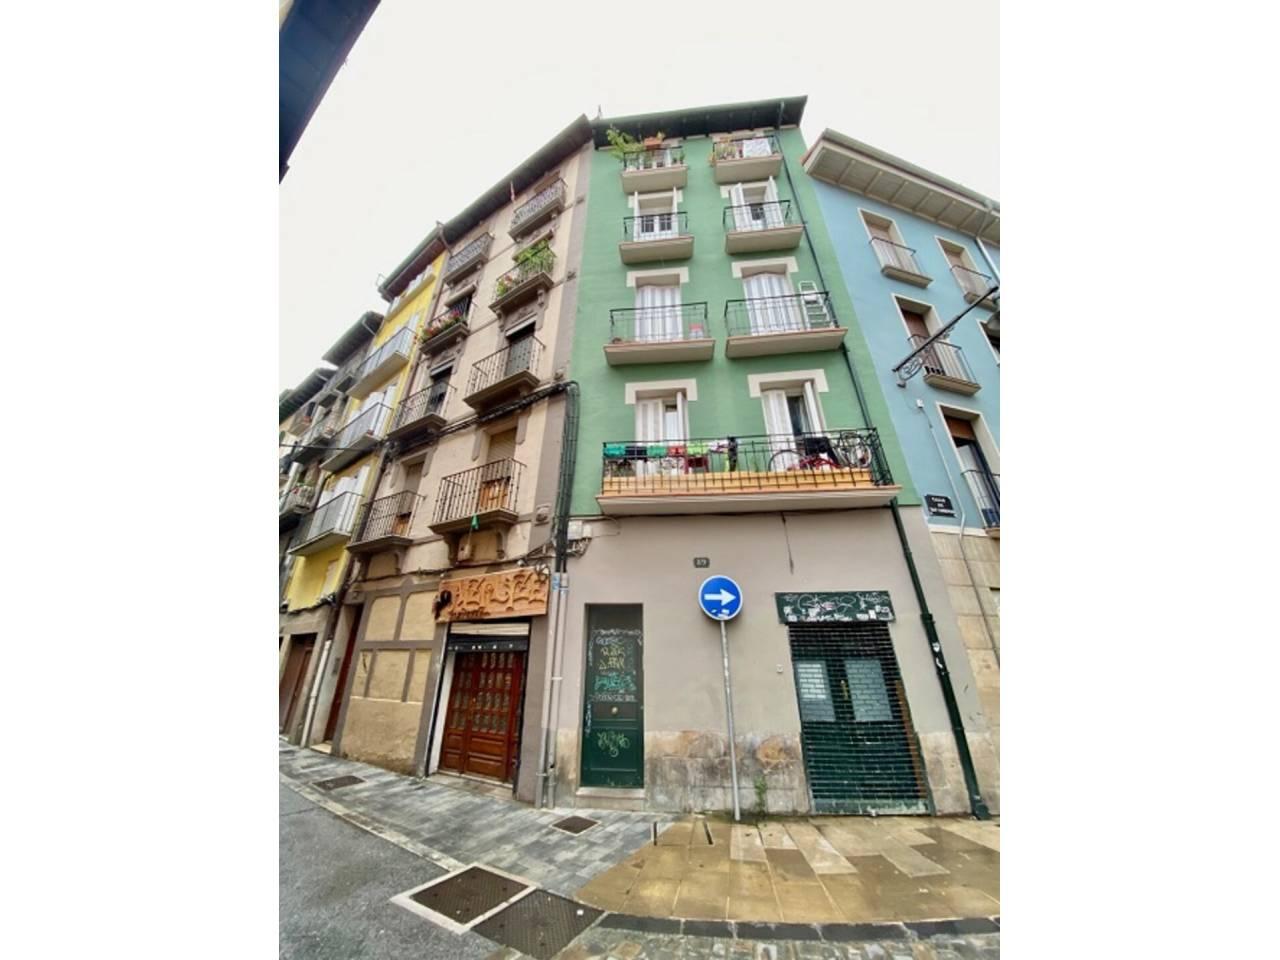 VENTA DE LOCAL EN CASCO ANTIGUO – ALDE ZAHARRA, PAMPLONA – IRUñA   REF. (004545)